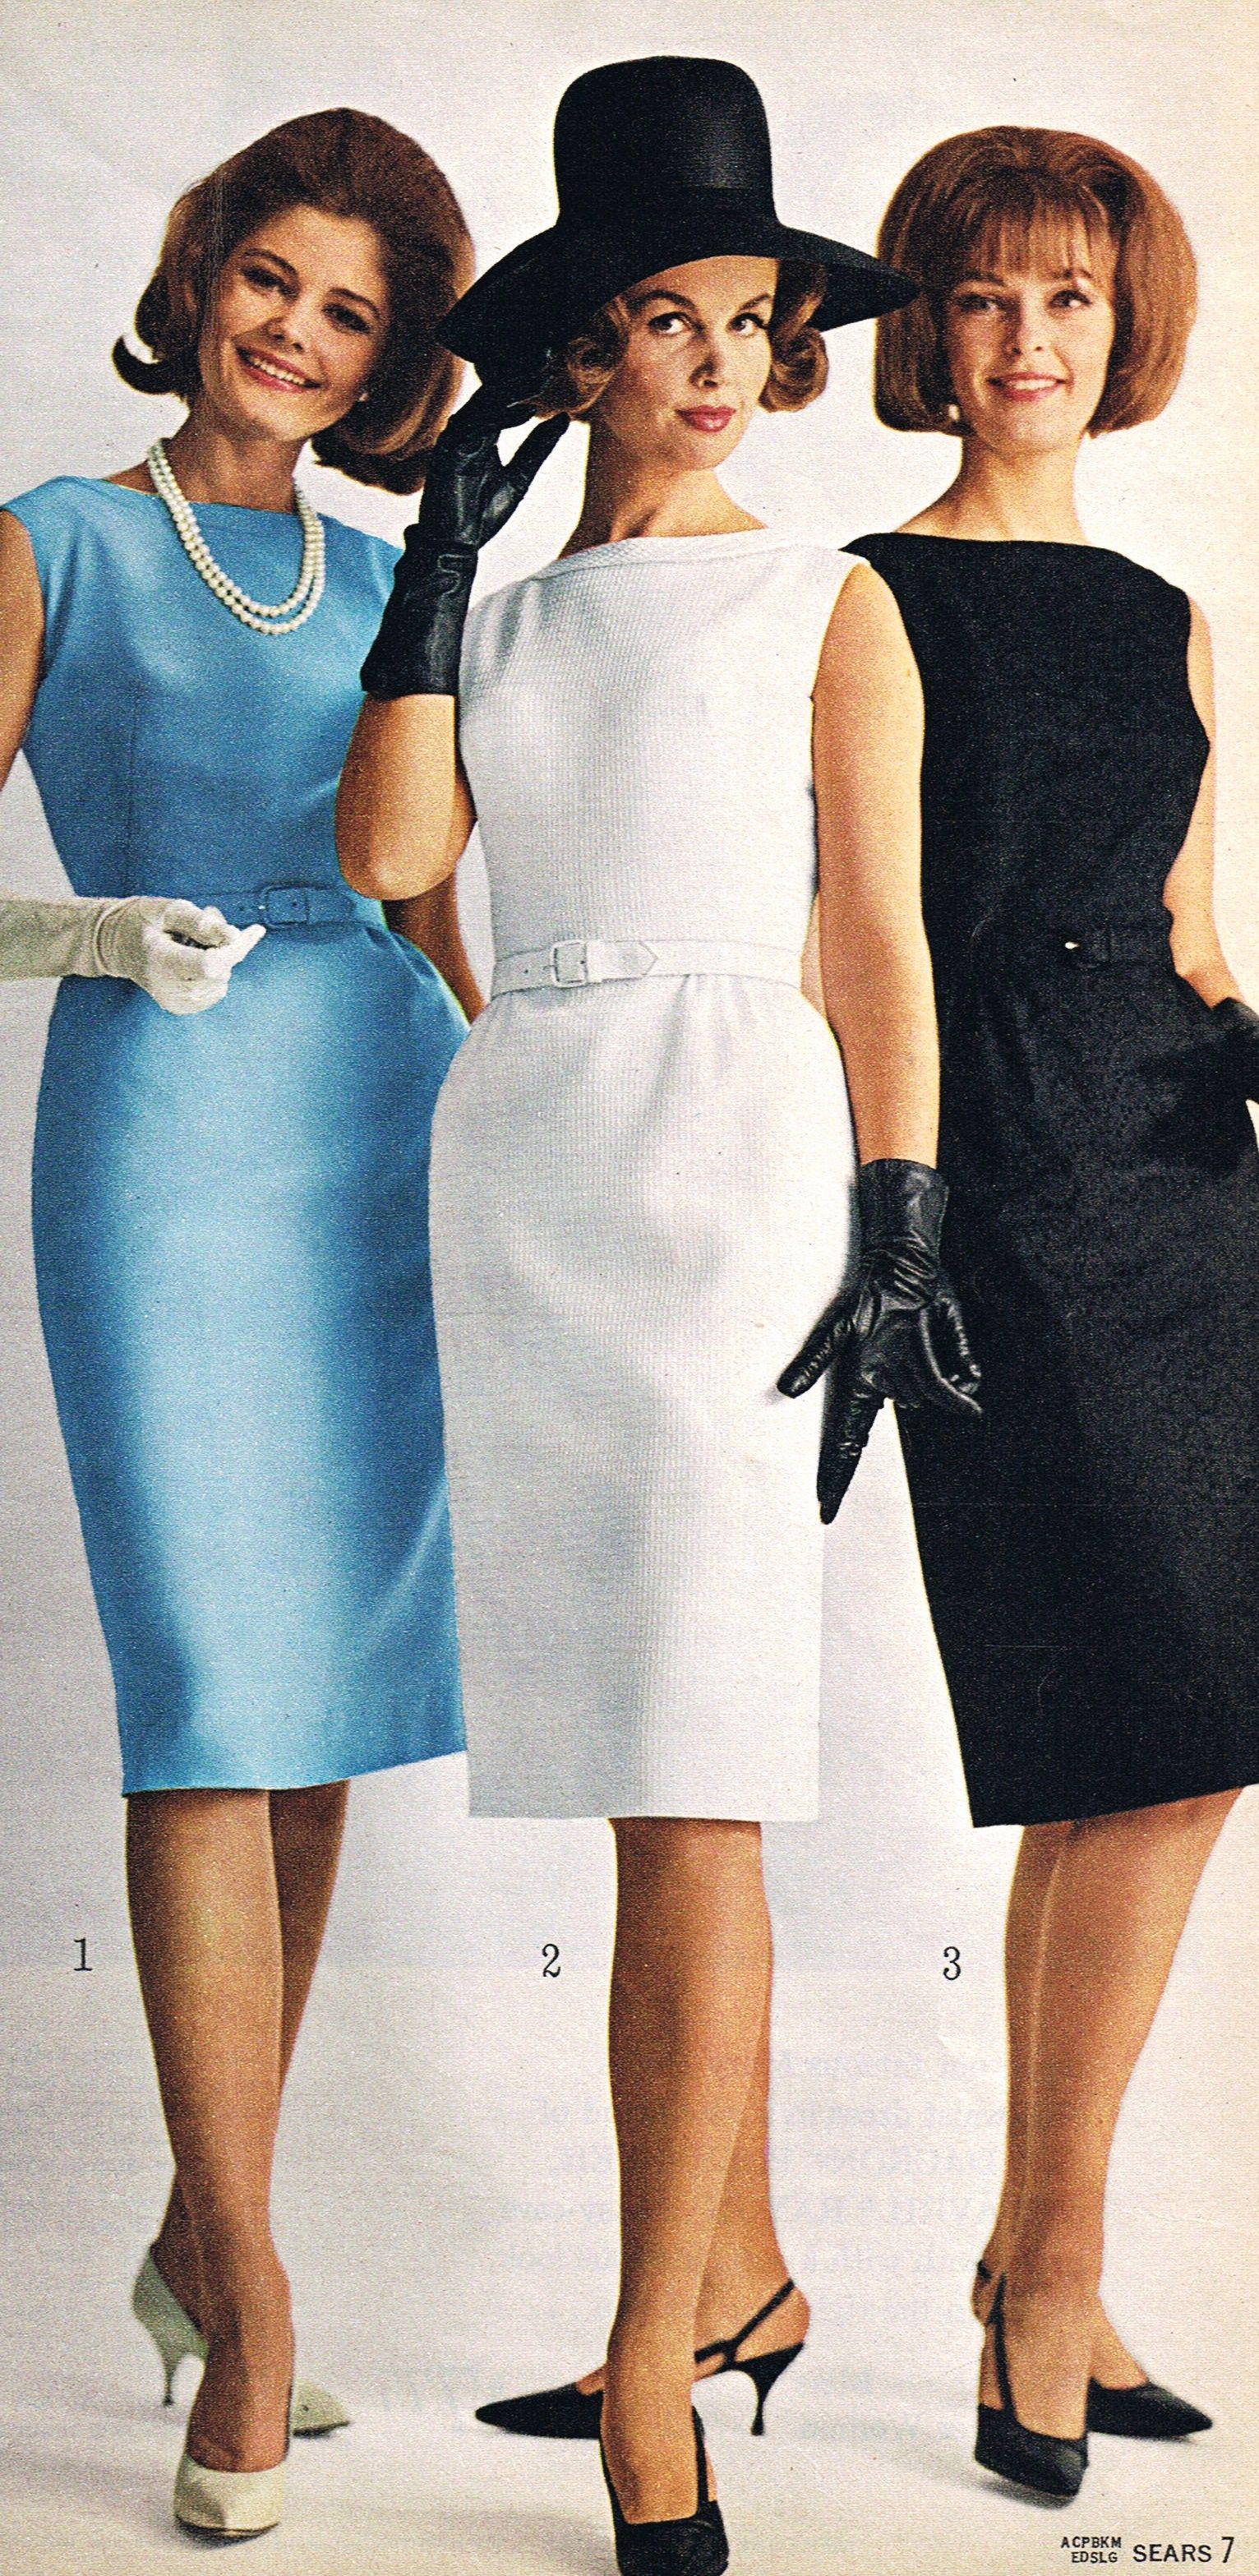 Sears vintage fashion style color photo print ad models